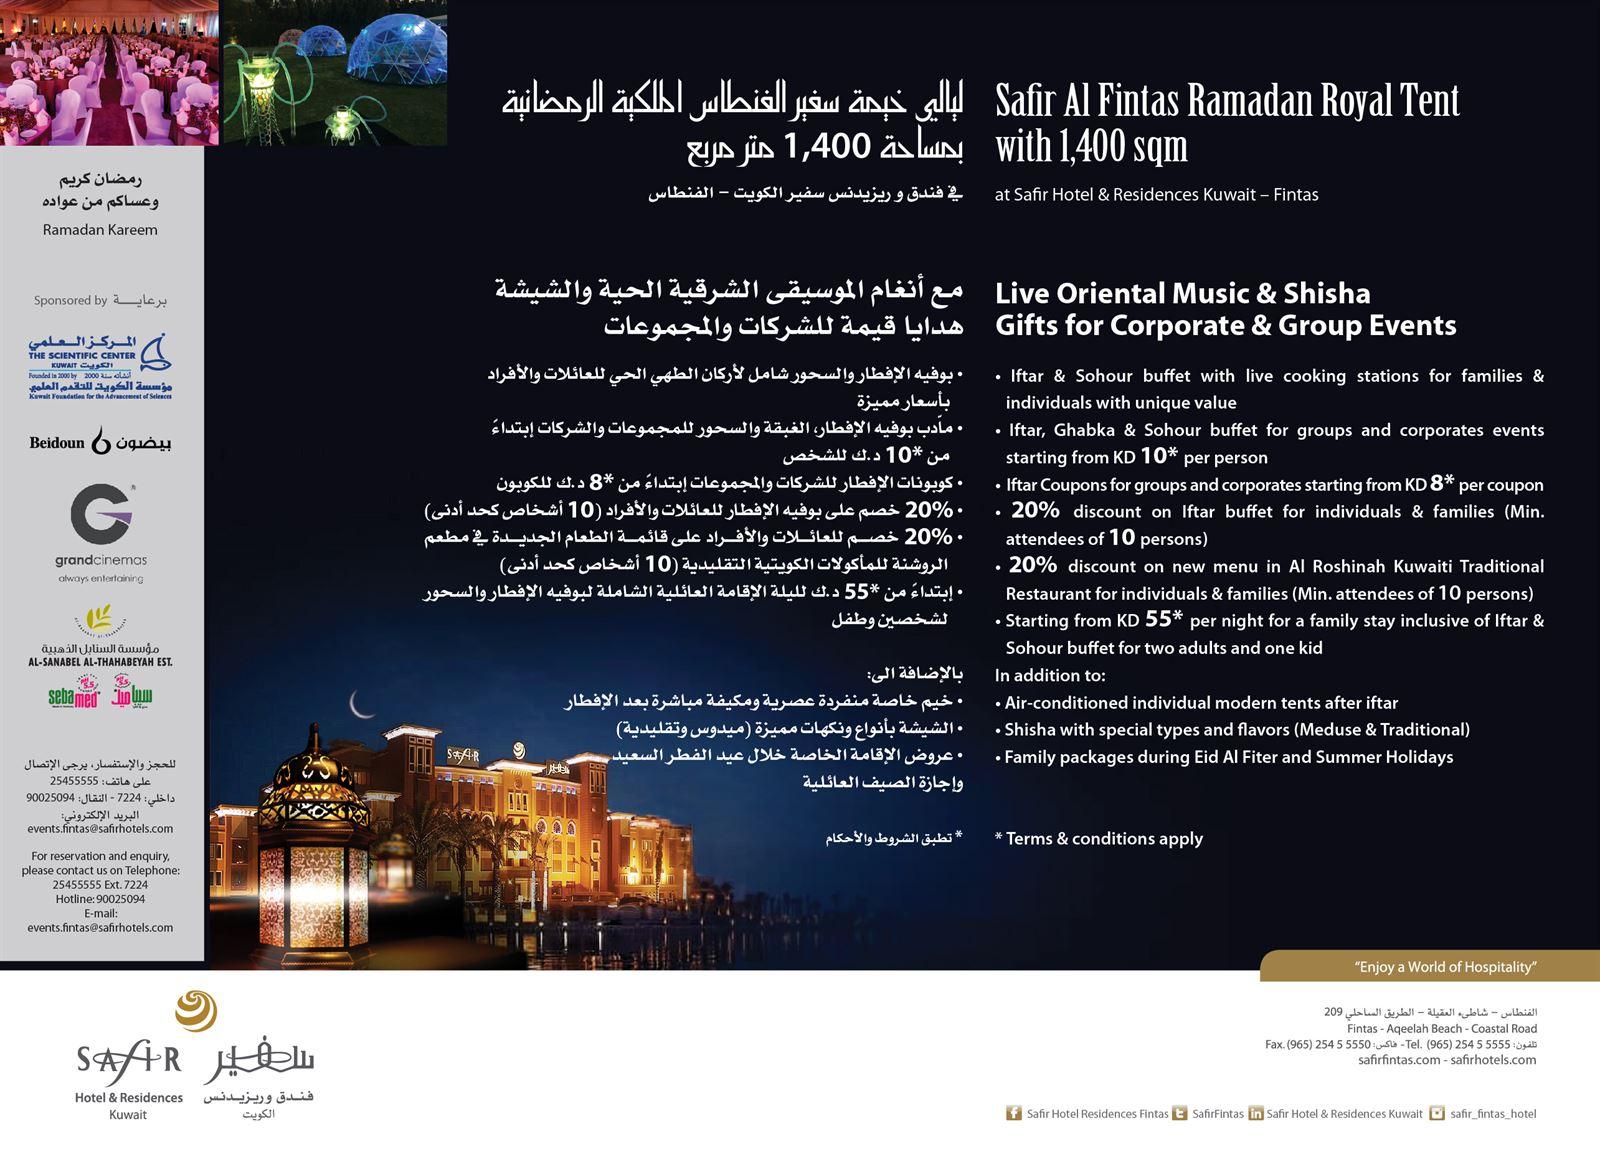 Safir Al Fintas Hotel Ramadan 2017 Offers :: Rinnoo net Website